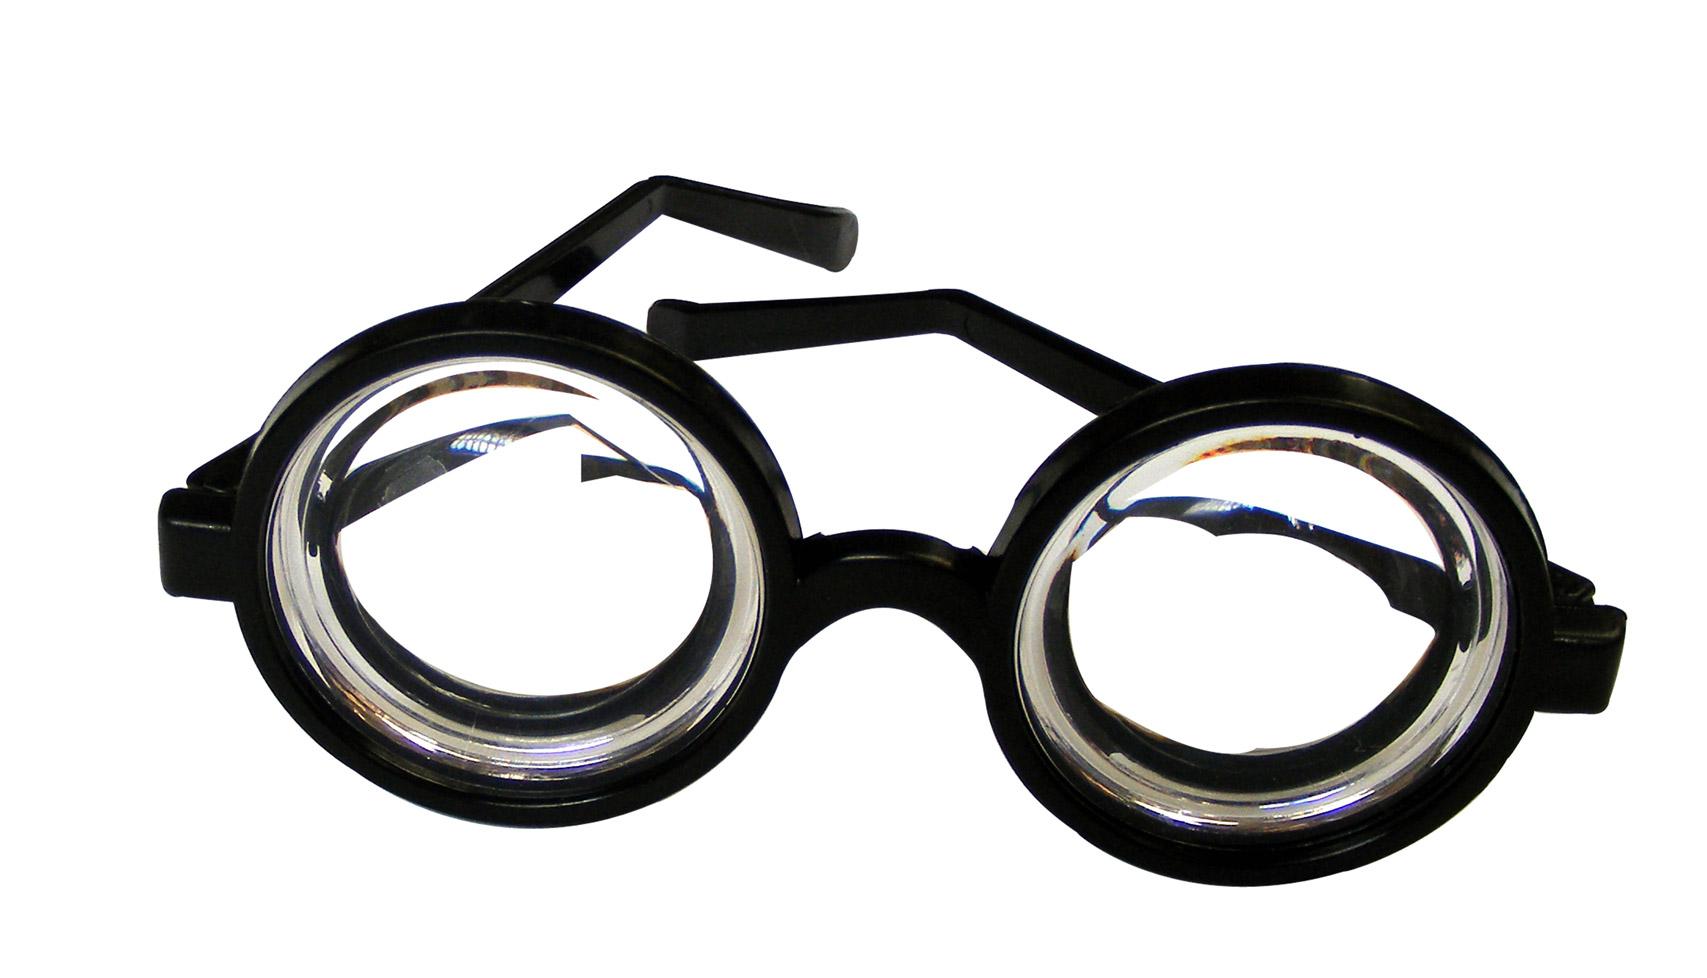 Gafas de tonto lentes gruesas plastico comprar barato